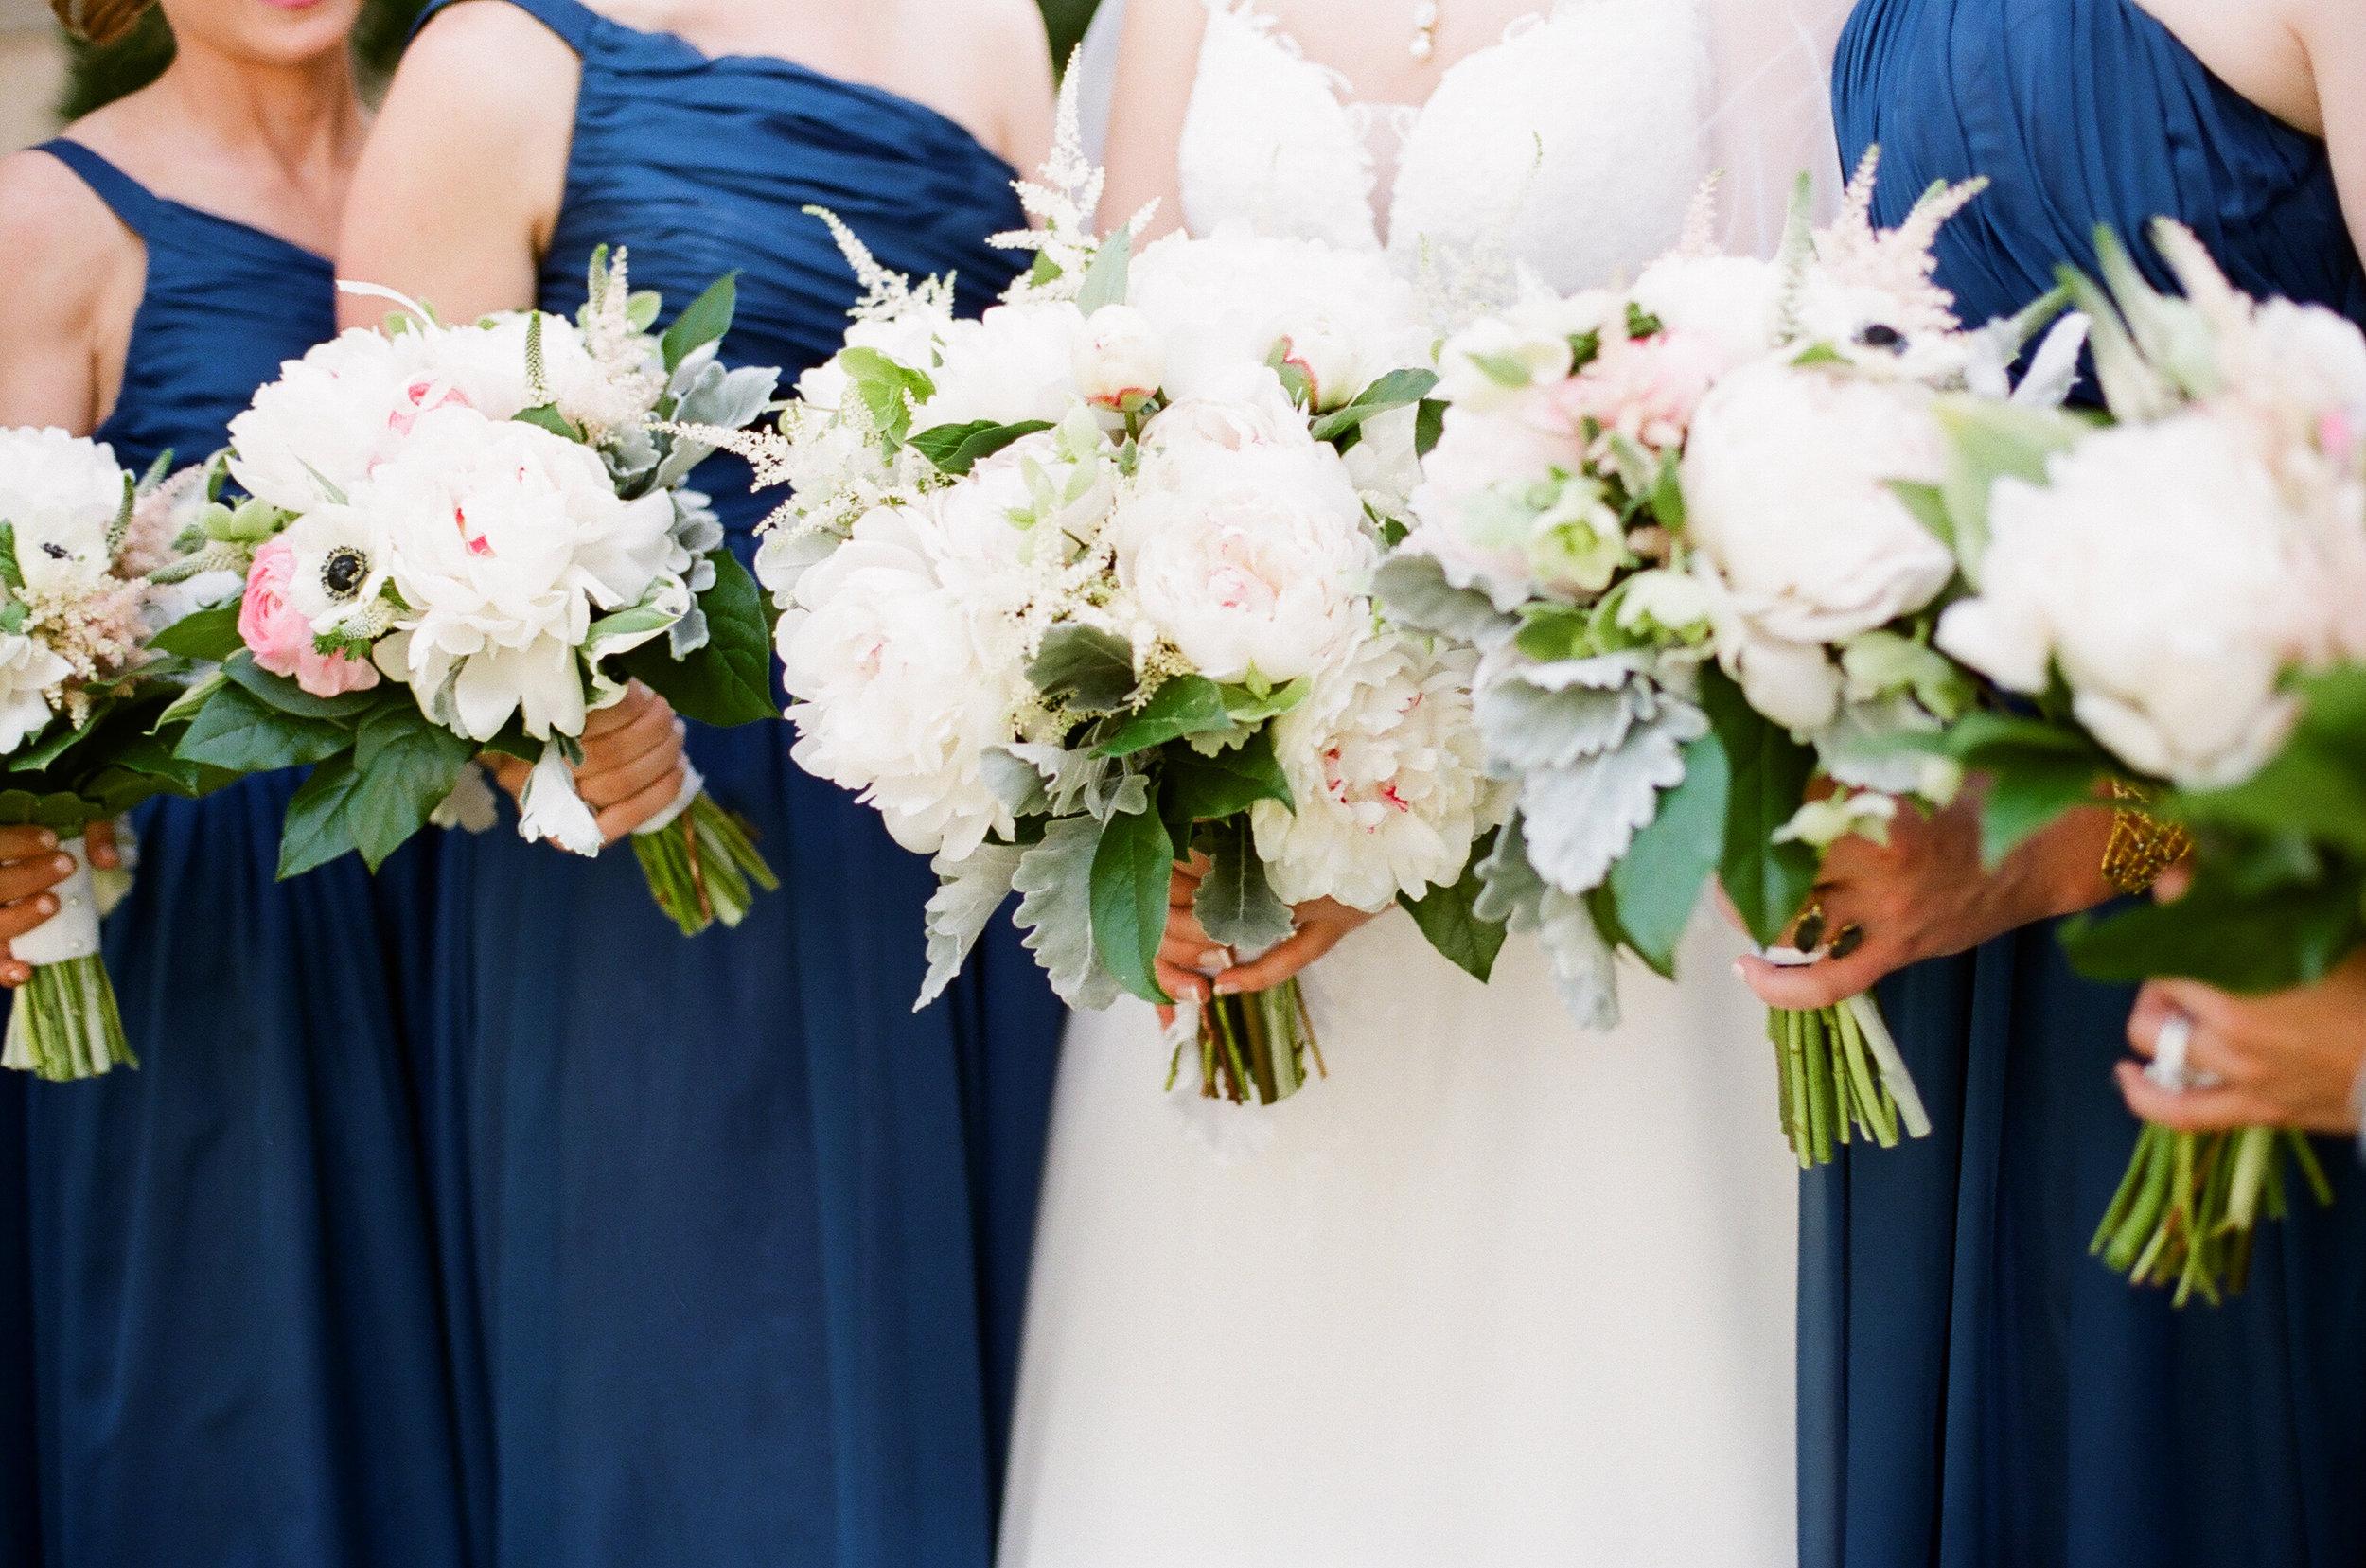 bride-bridesmaids-bouquets-greg-boulus-events-augusta-georgia